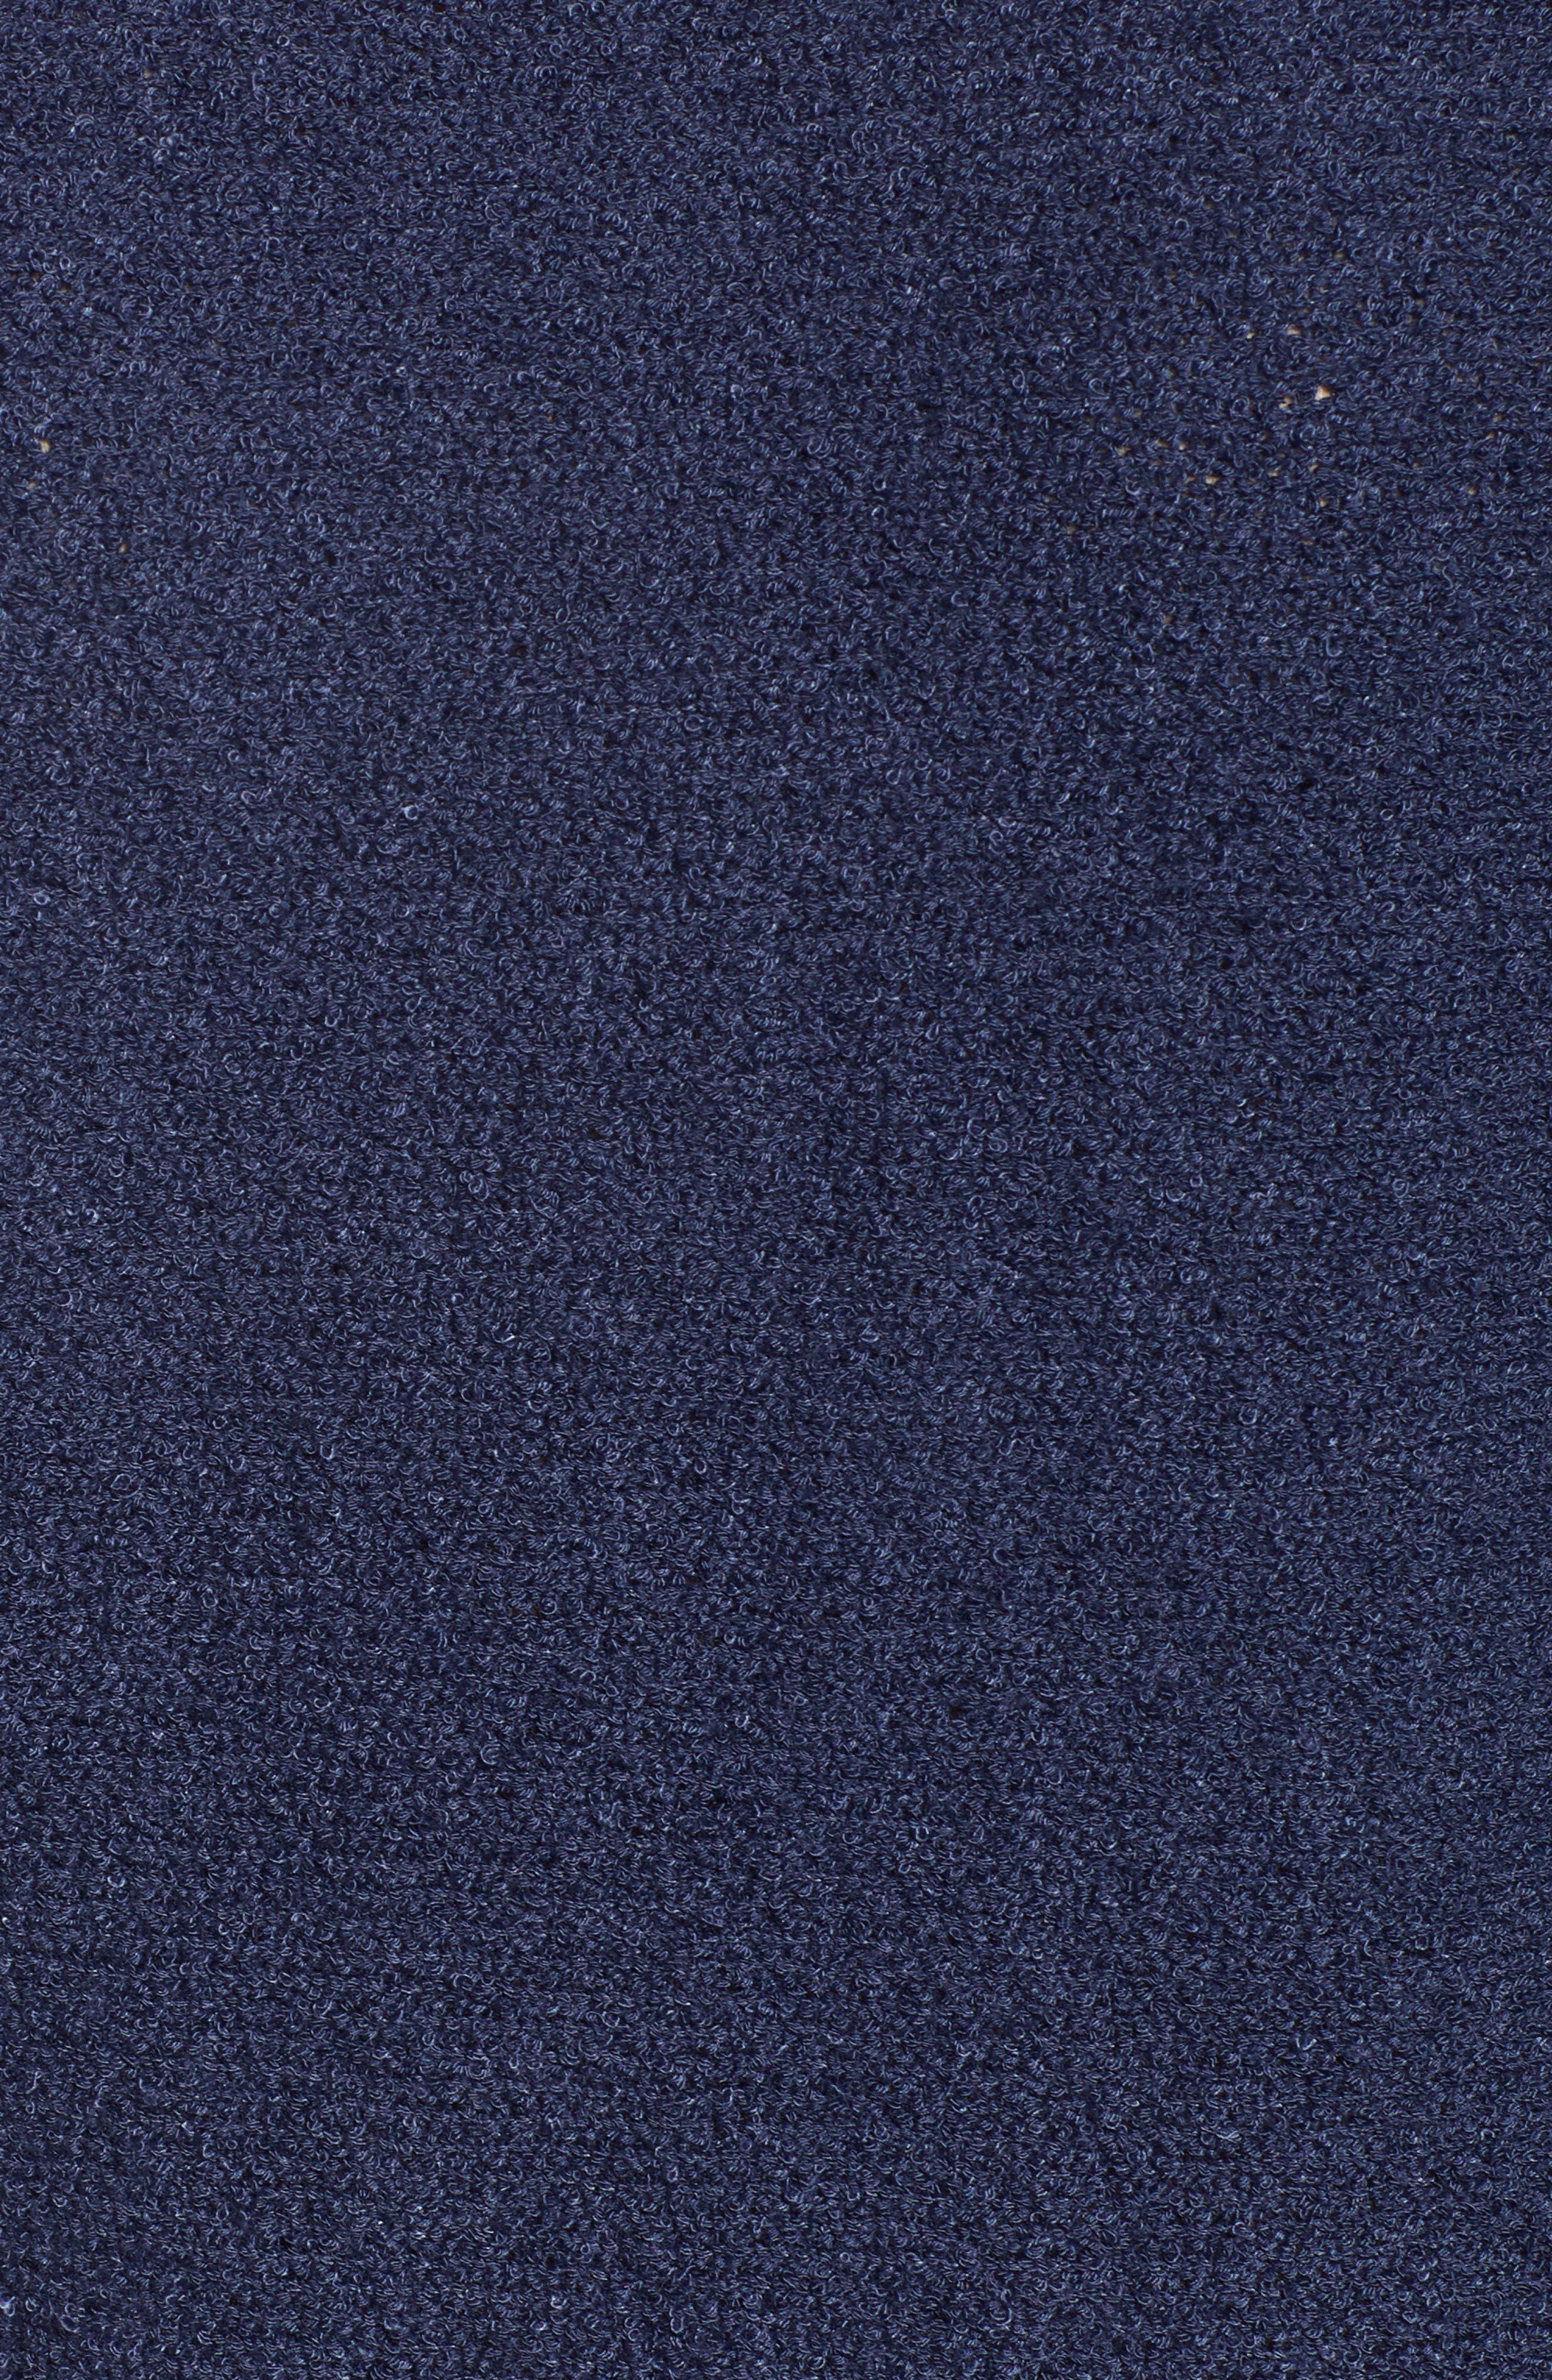 Calson<sup>®</sup> Dolman Sleeve Sweater,                             Alternate thumbnail 6, color,                             Navy Indigo